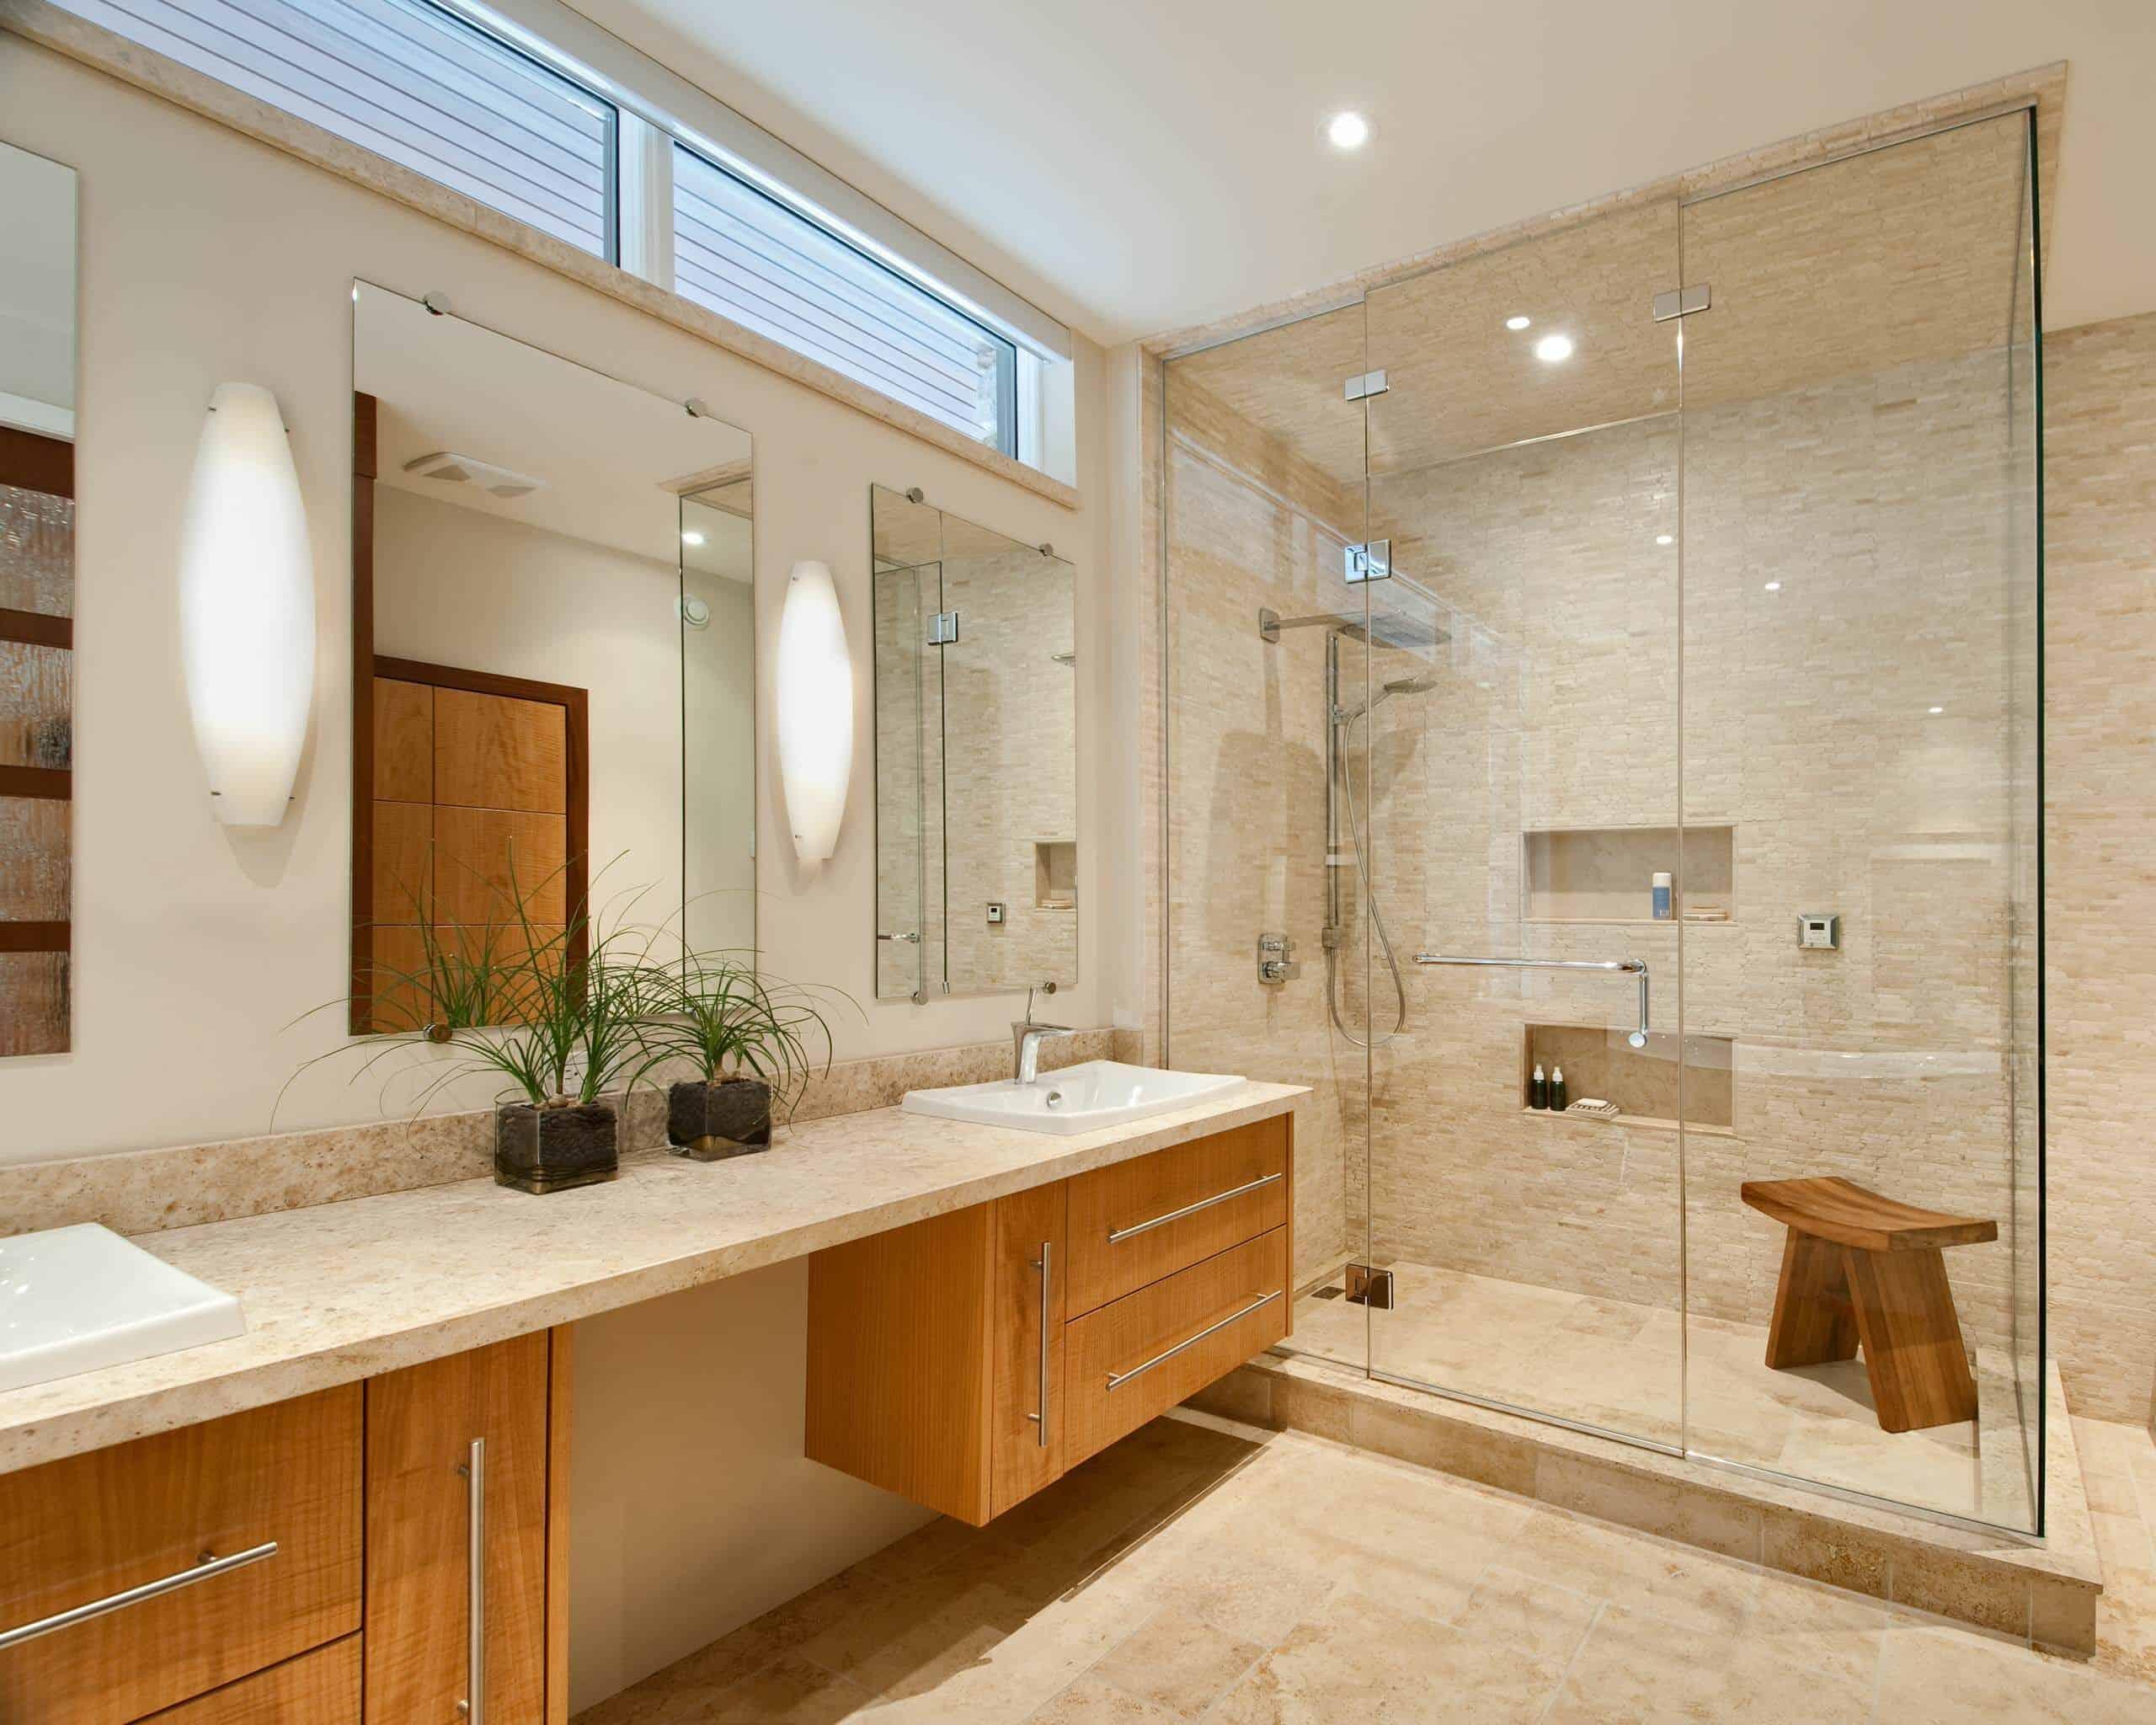 luxury bathroom with teak Best shower bench ideas to reinvent your bathroom